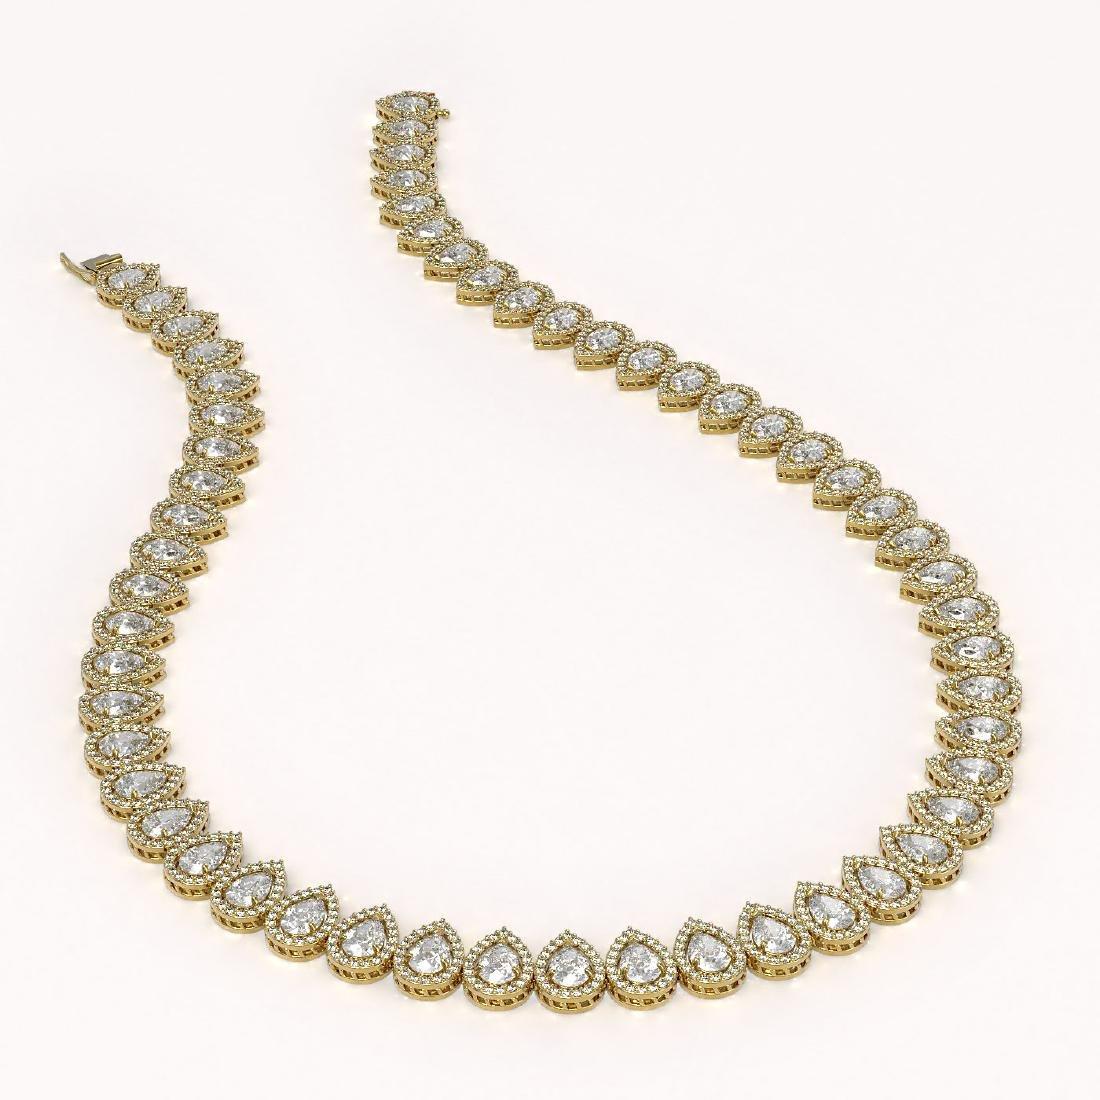 34.83 CTW Pear Diamond Designer Necklace 18K Yellow - 2